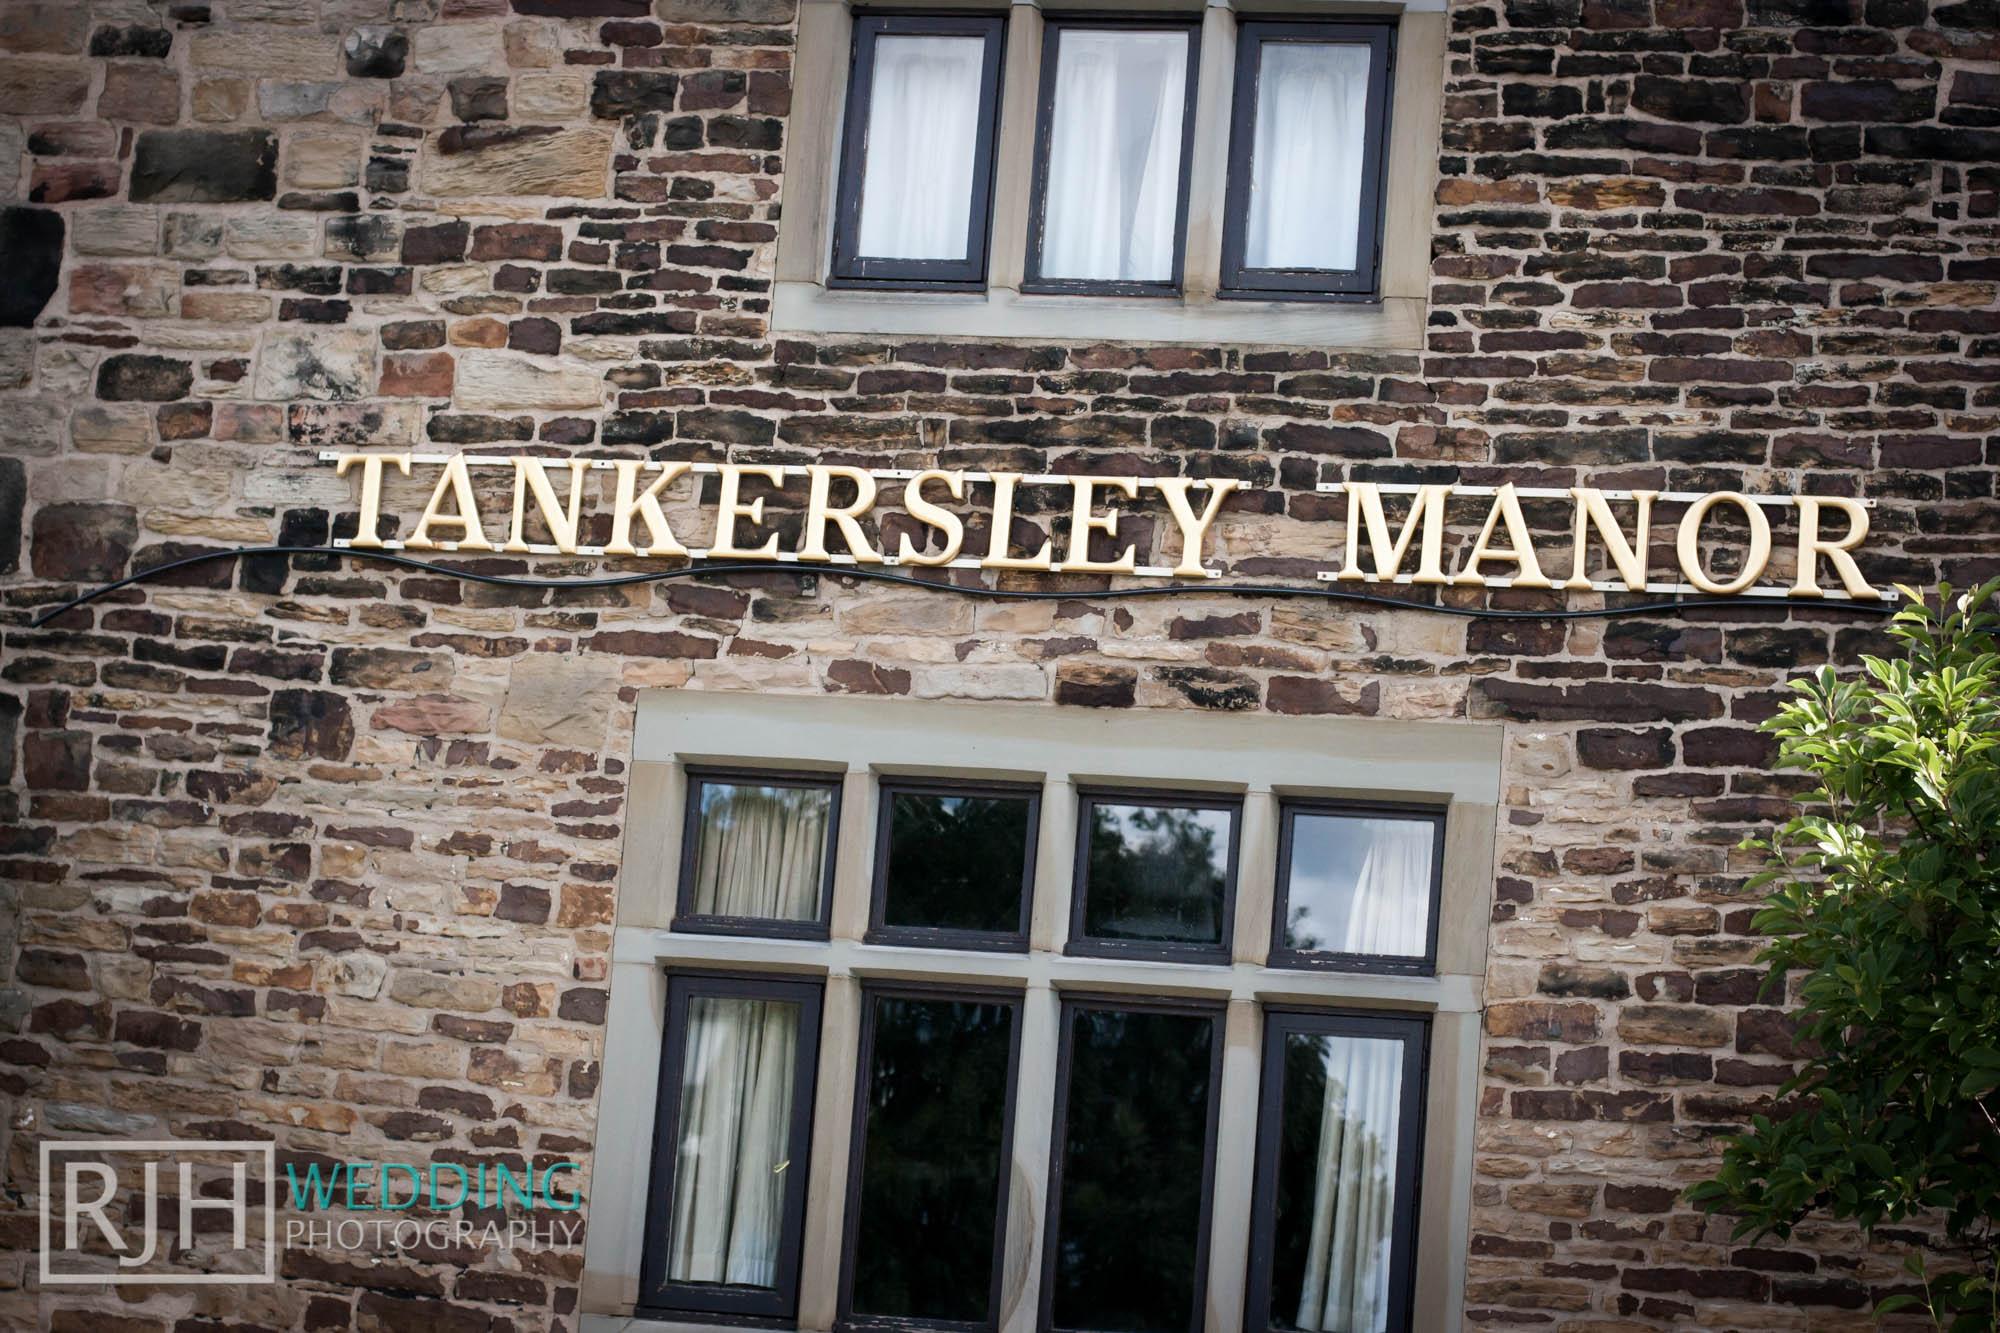 RJH Wedding Photography_Tankersley Manor Wedding_01.jpg